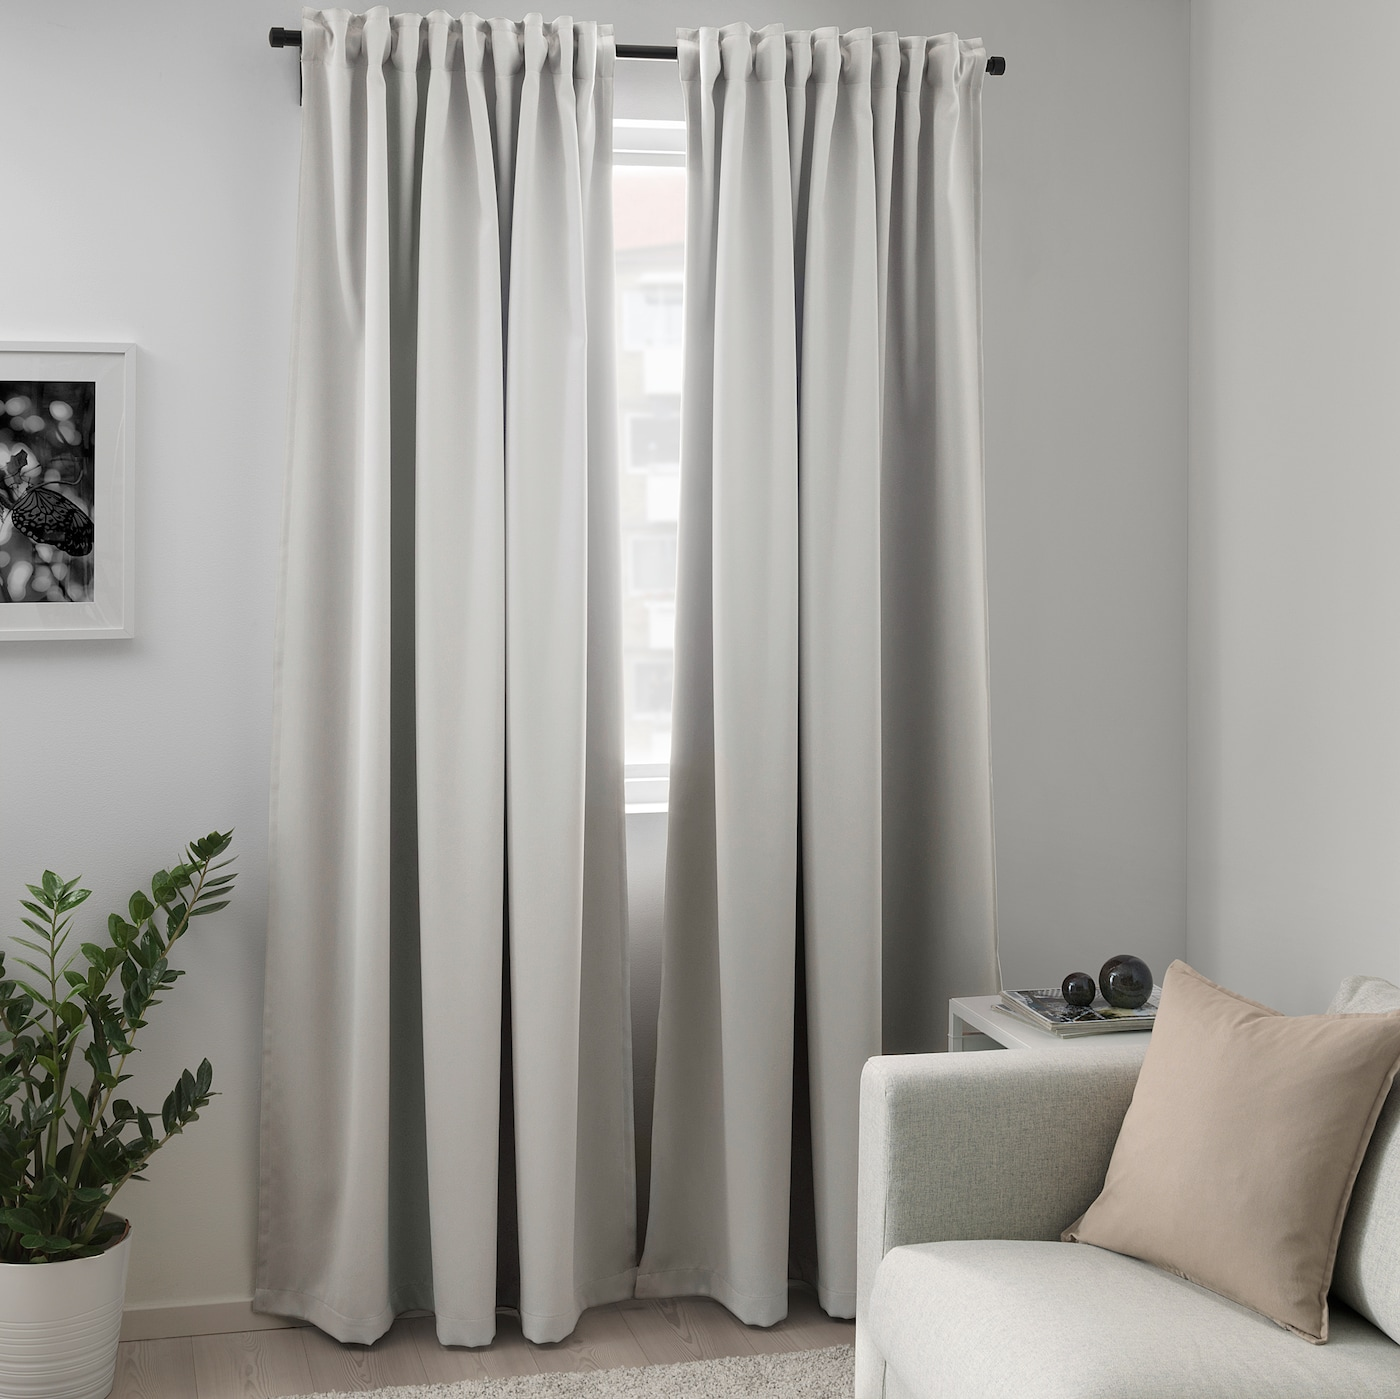 MAJGULL room darkening curtains, 1 pair light grey 250 cm 145 cm 2.00 kg 3.63 m² 2 pack